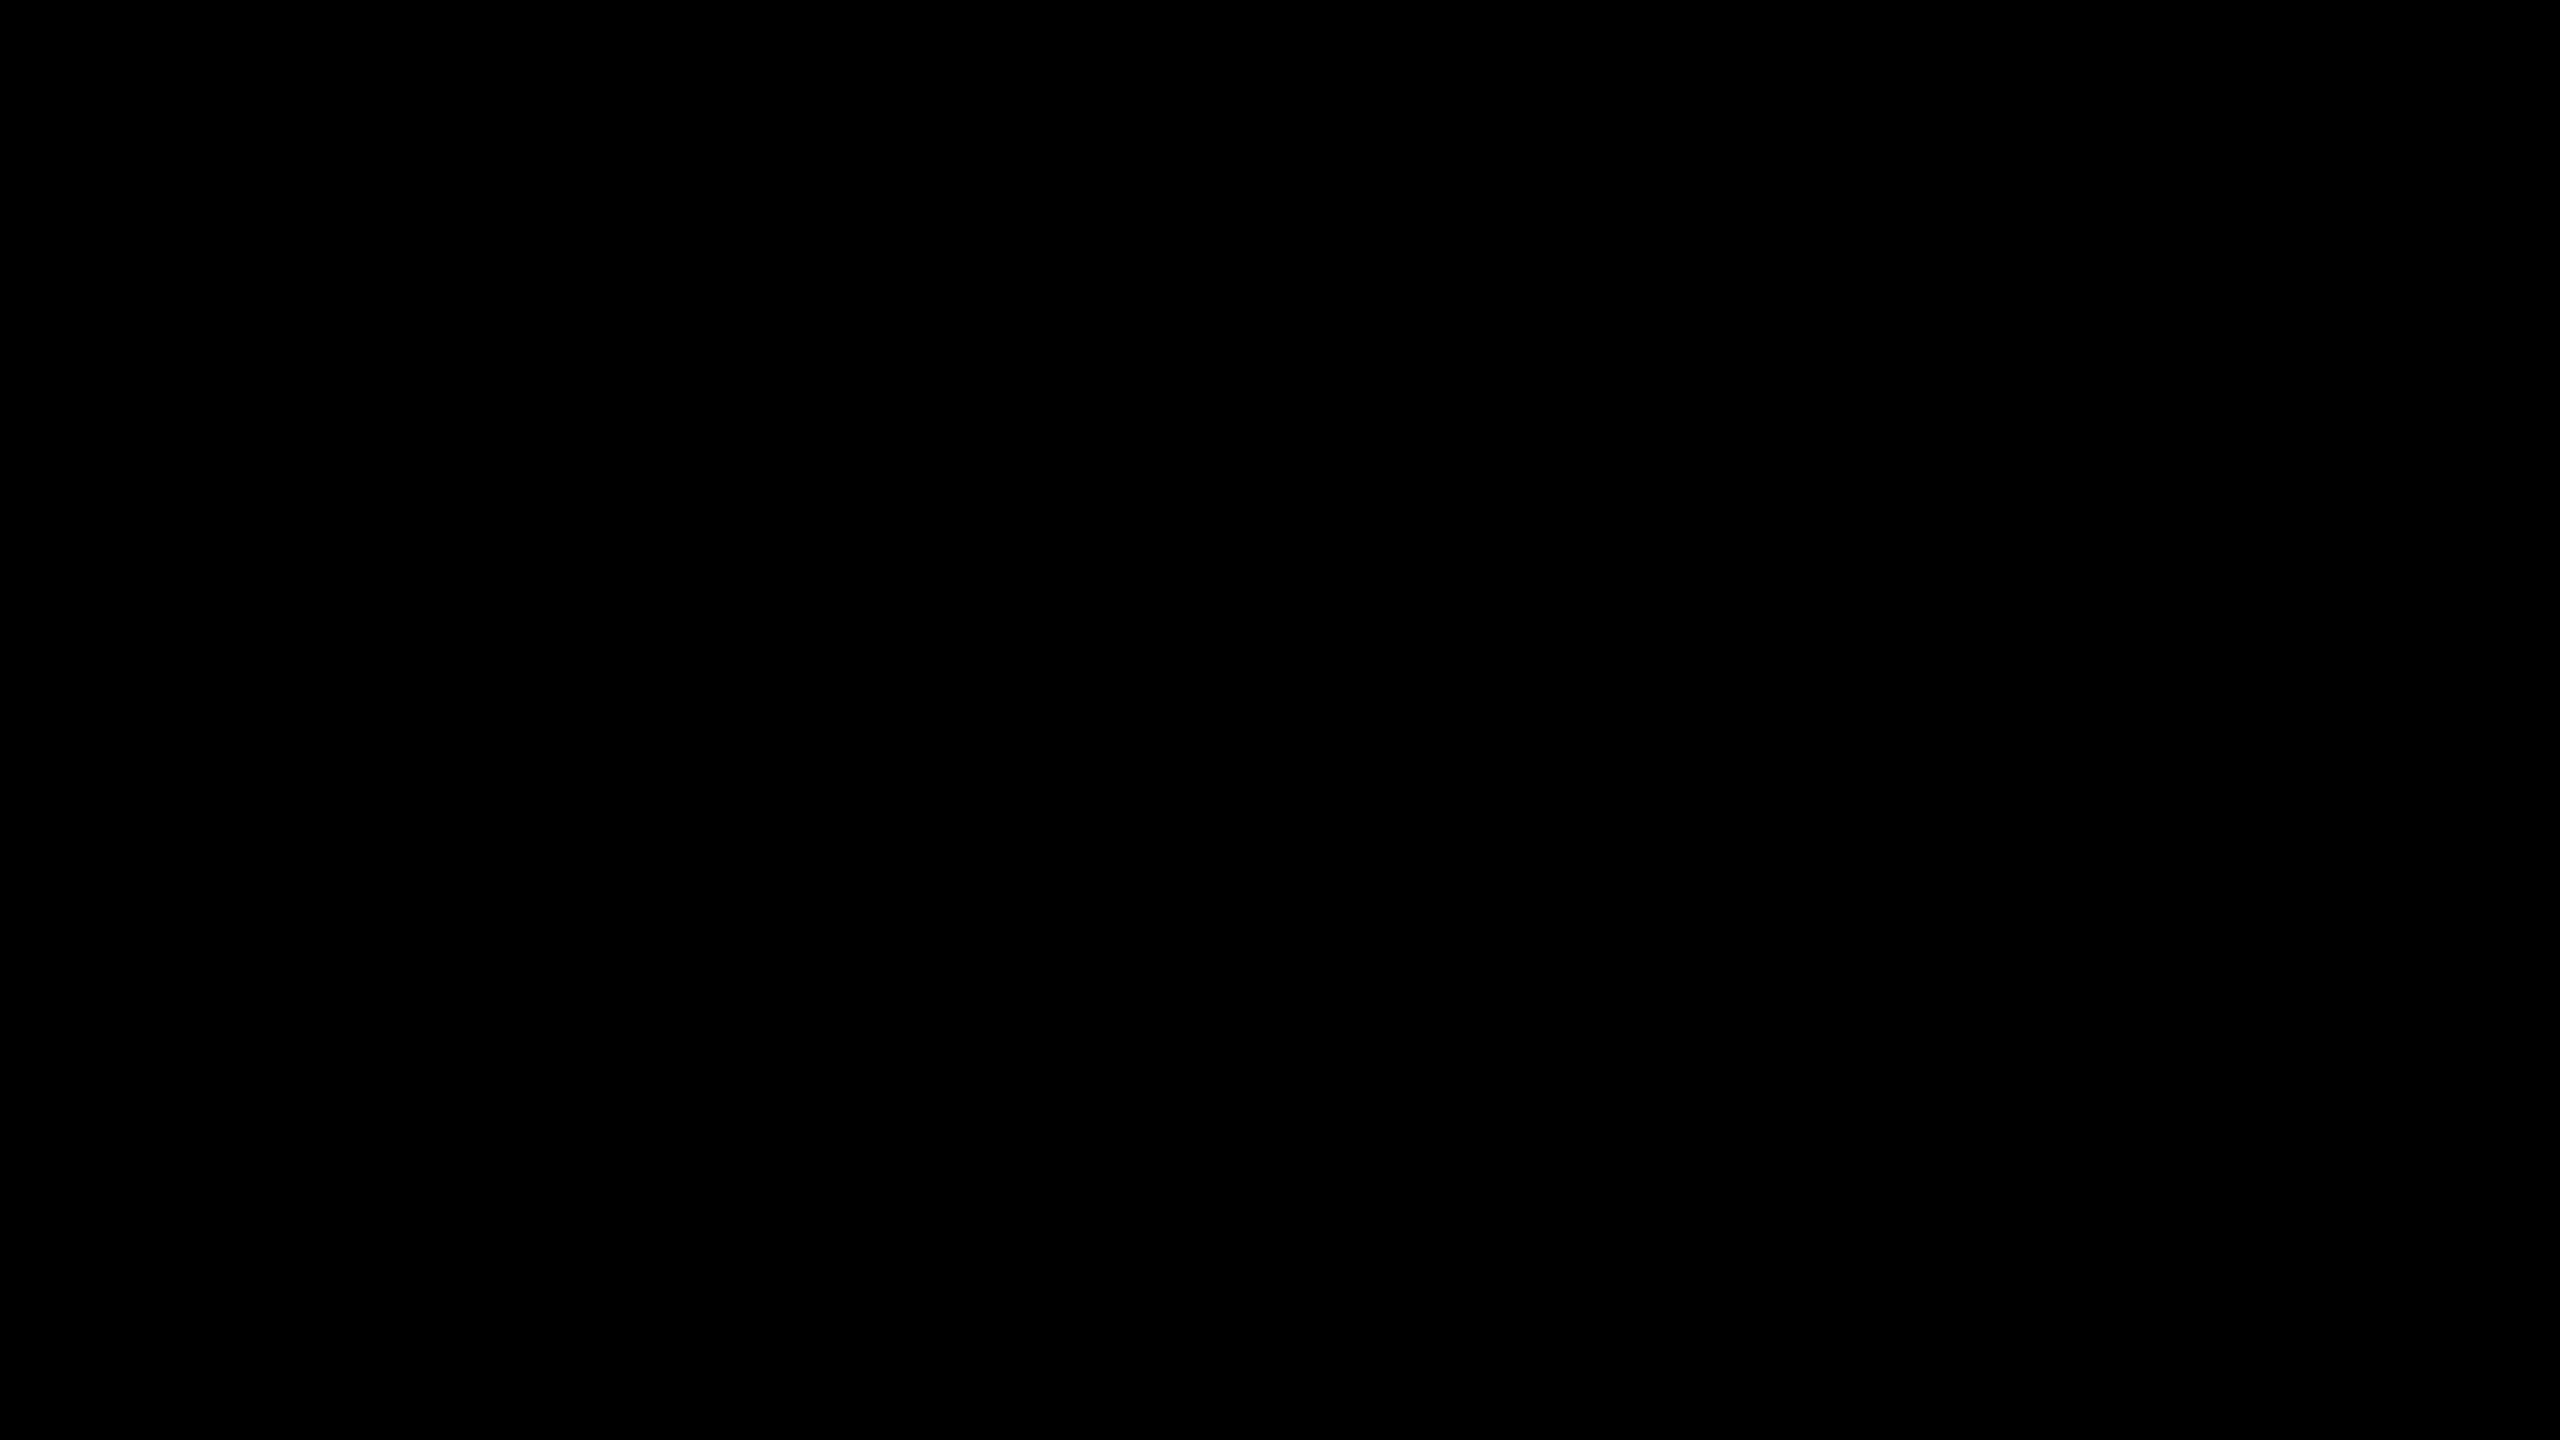 BeamNG DRIVE, DestructionNation, Video Games, beamng, beamng crashes, best car crash compilation, car ???, caught on camera, dash camera, horrible car crash, ps3, ps4, road camera, roadcam, scariest car crash compilation, scariest car crashes, worst car crash compilation, xbox, xbox 360, xbox one, Extreme Police Chases Crashes&Fails #7 - BeamNG DRIVE GIFs